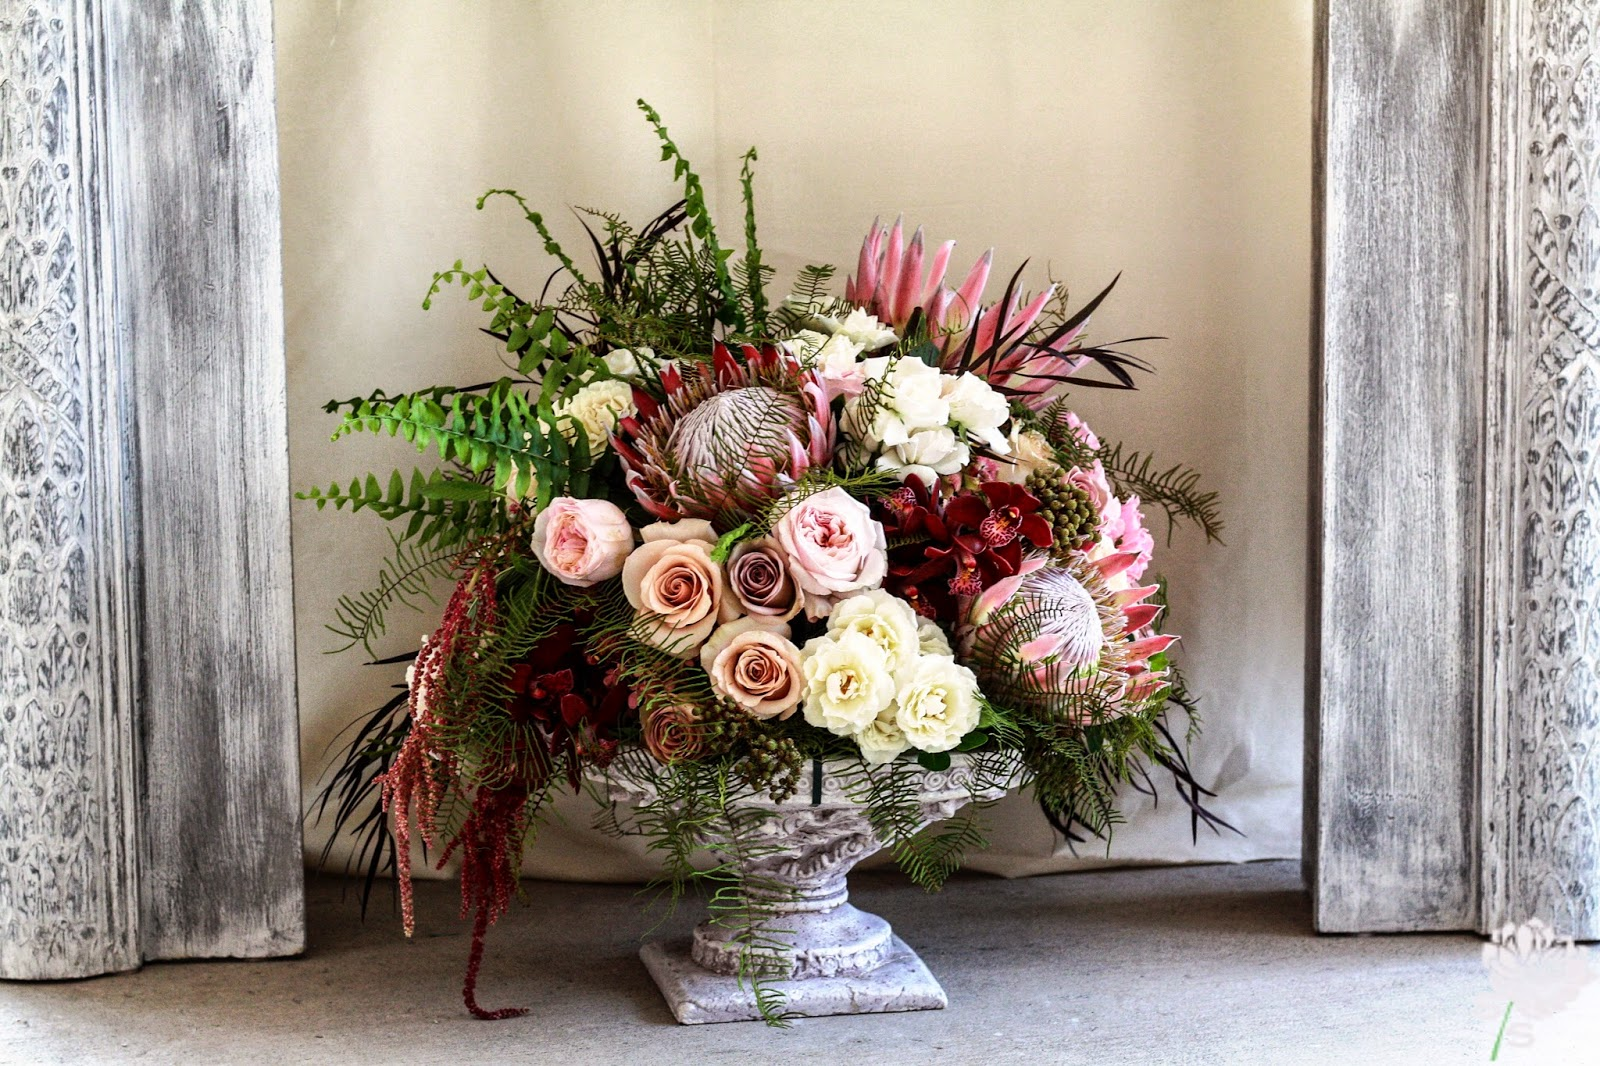 The Roundhouse Wedding - Beacon, NY - Hudson Valley Wedding - Ceremony Arrangement - Wedding Flowers - Splendid Stems Floral Designs